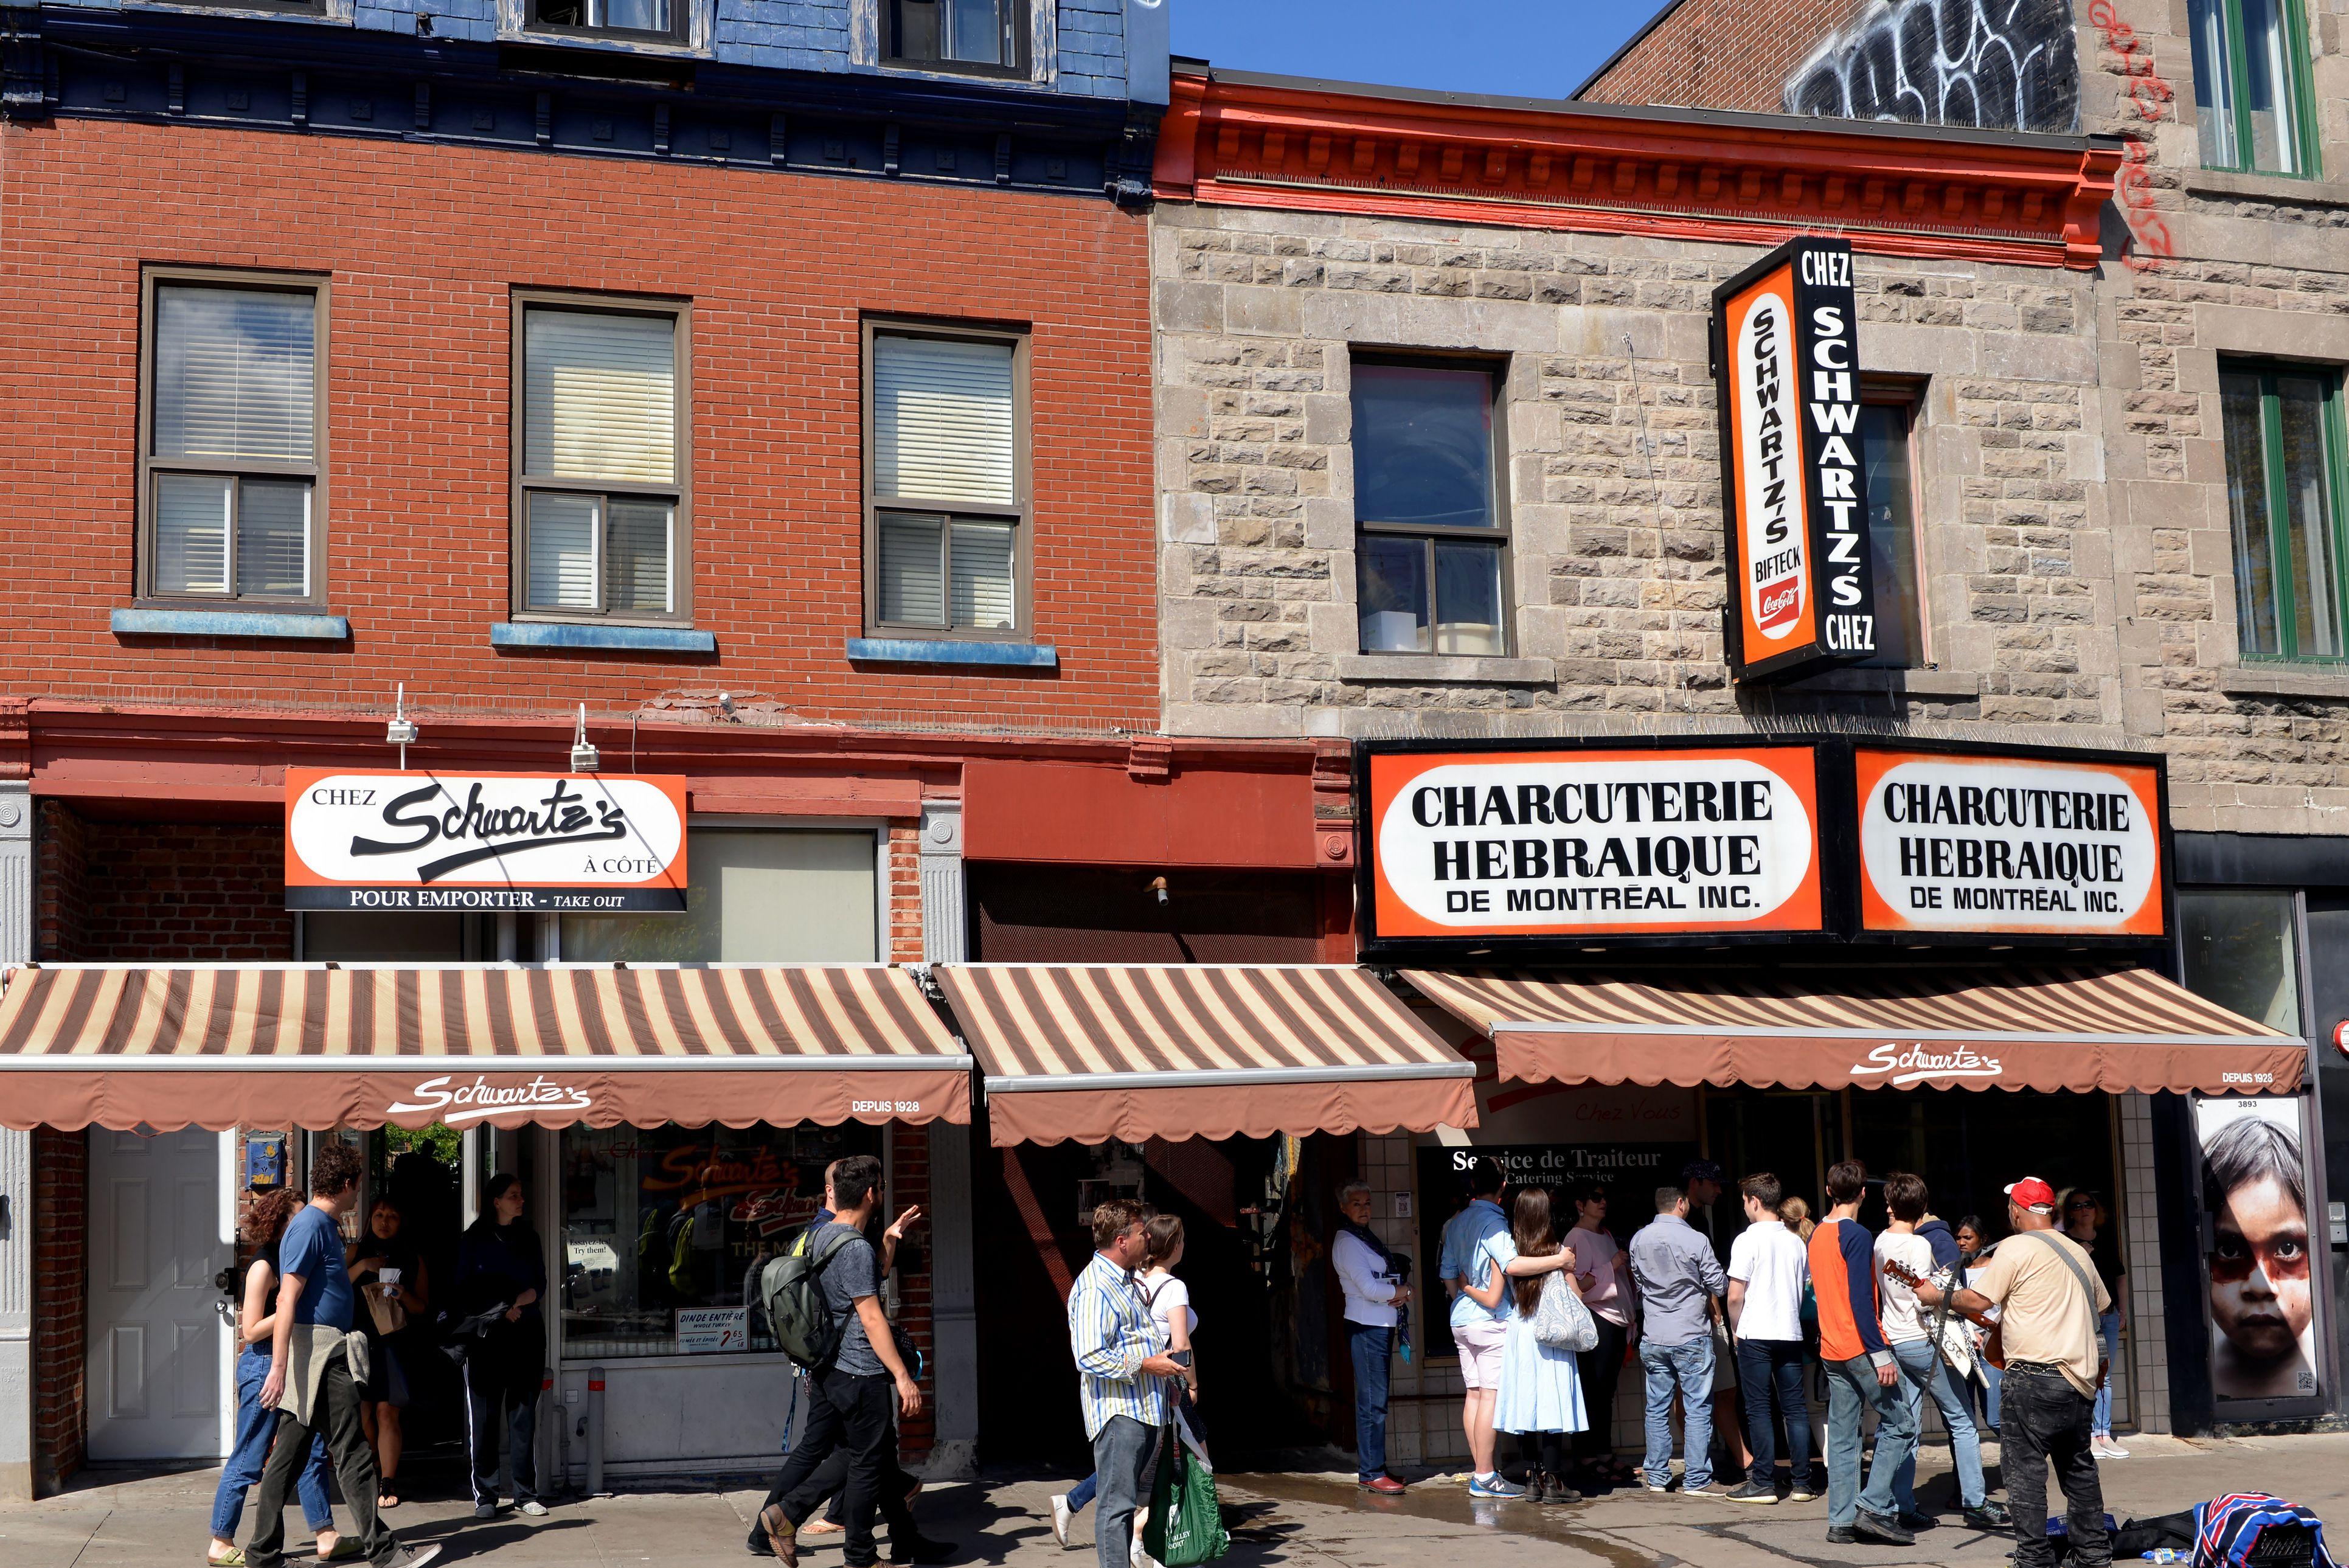 People standing outside of Schwartz's Deli in Montreal